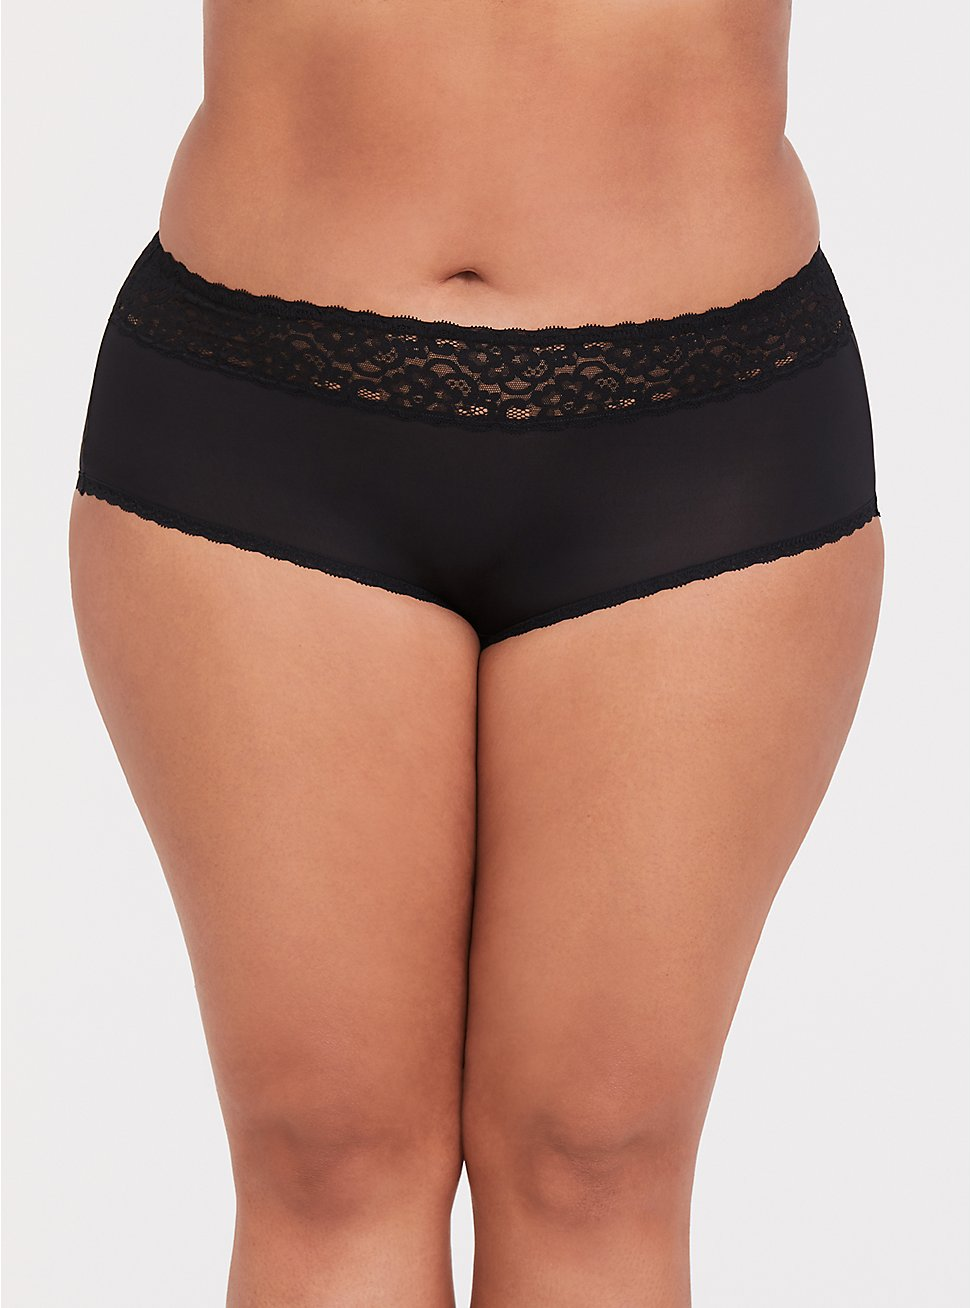 Black Wide Lace Shine Cheeky Panty, RICH BLACK, hi-res